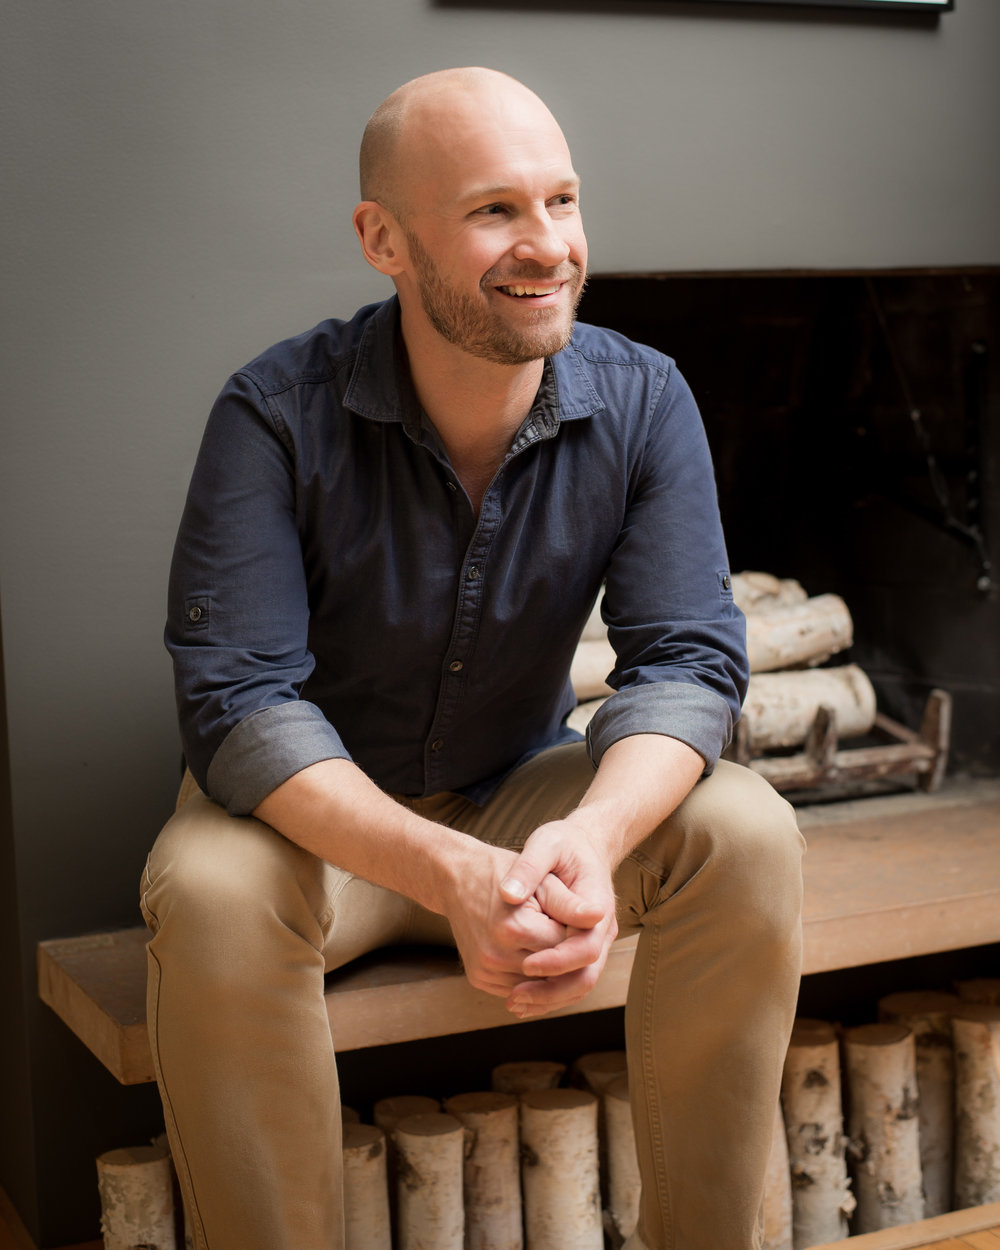 Aaron Douglas Smith, Allied ASID - Owner, Principal Designer